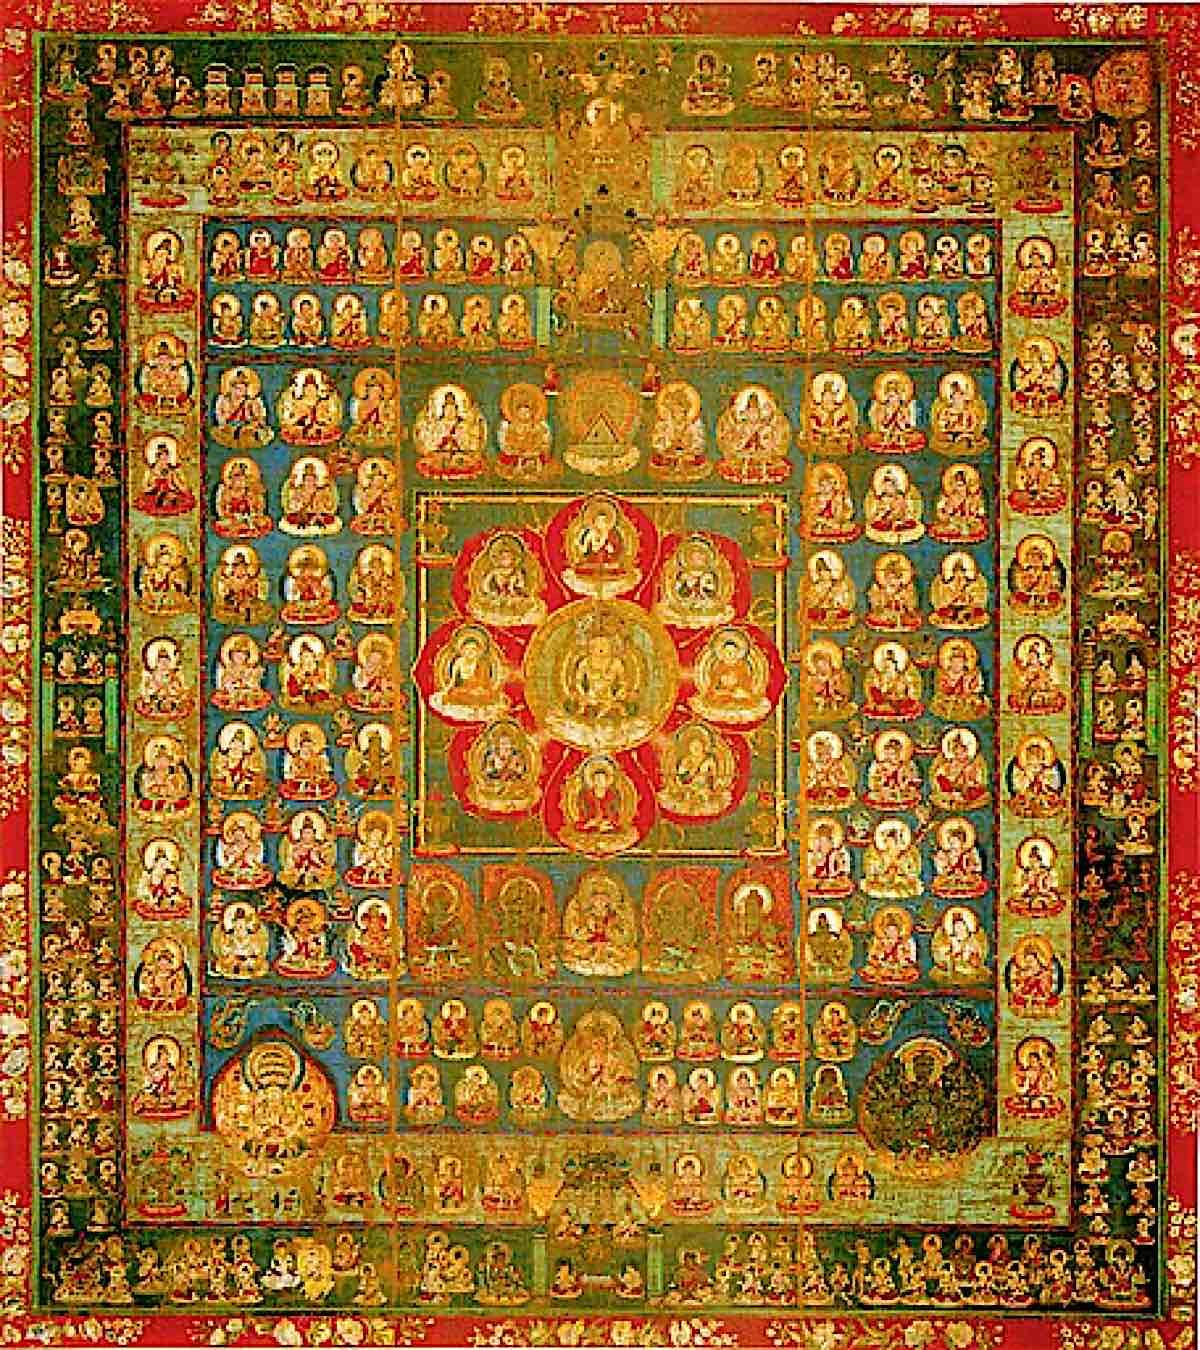 Buddha Weekly Womb Realm Mandala Vairocana surrounded by 8 Buddhas 456px Taizokai Buddhism